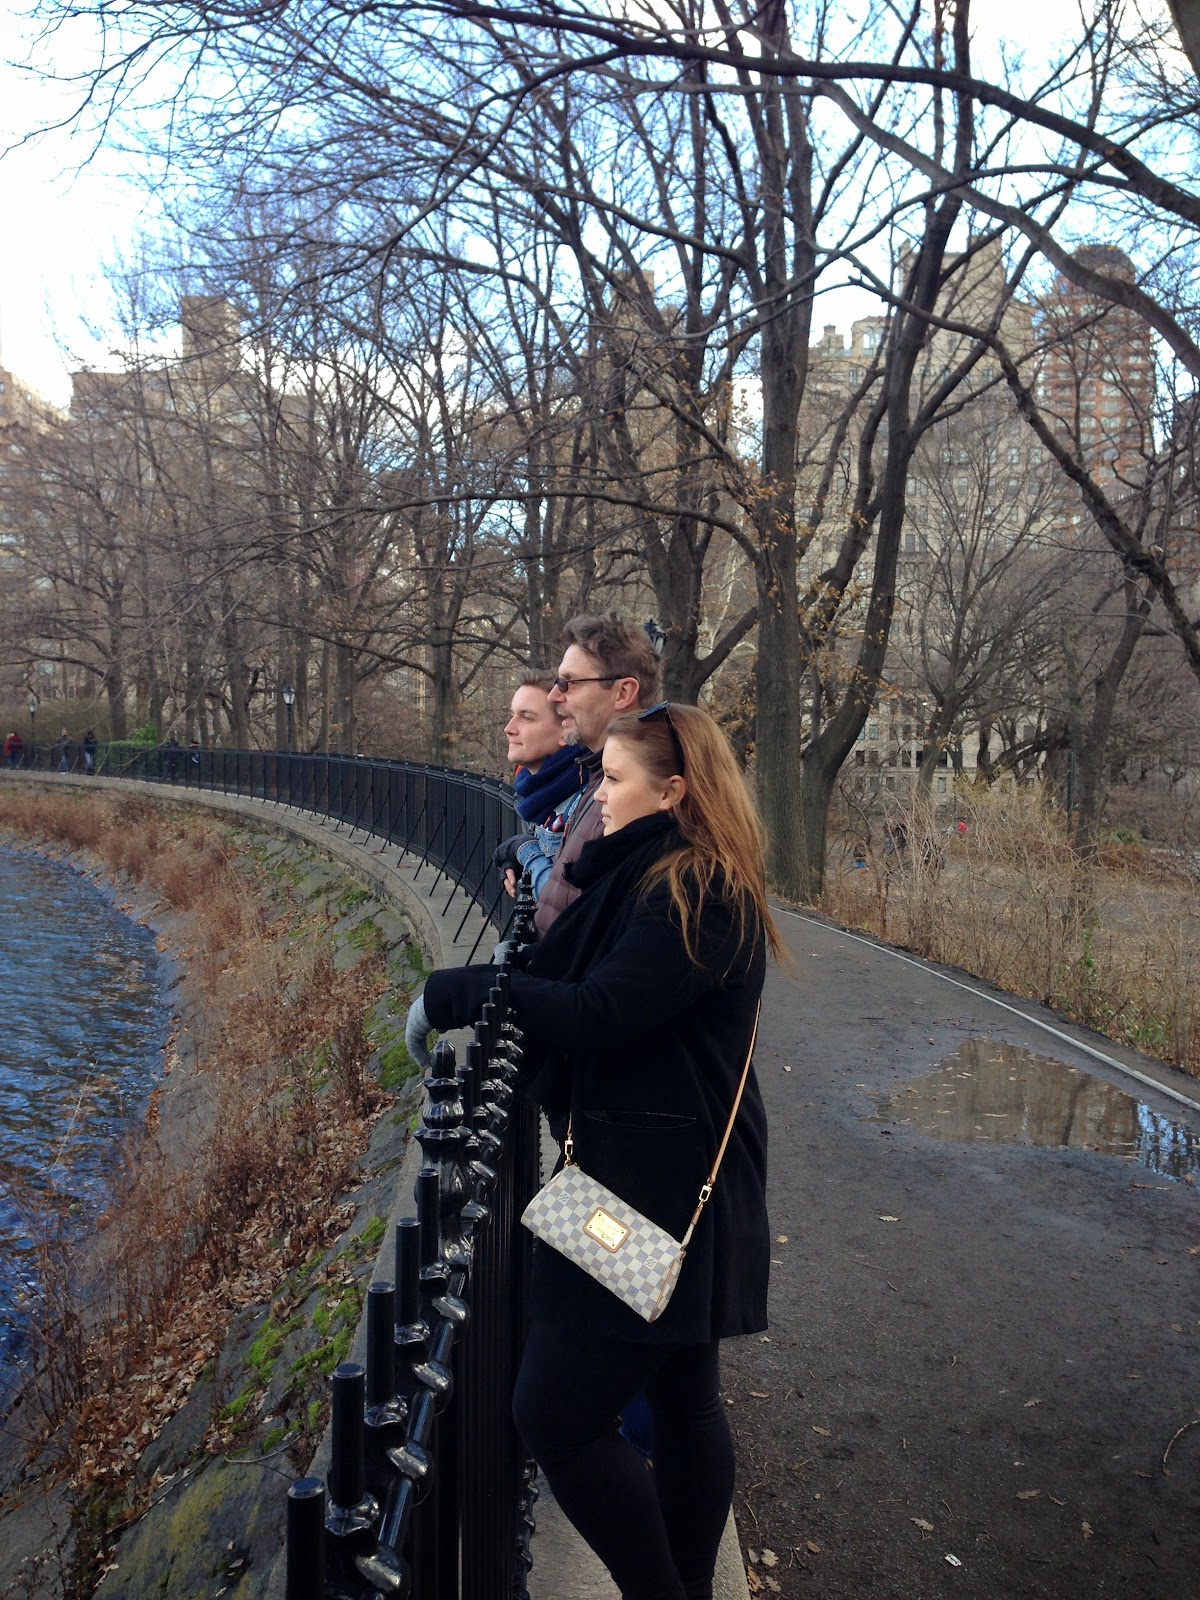 Central Park Jacqueline Kennedy Onassis Reservoir